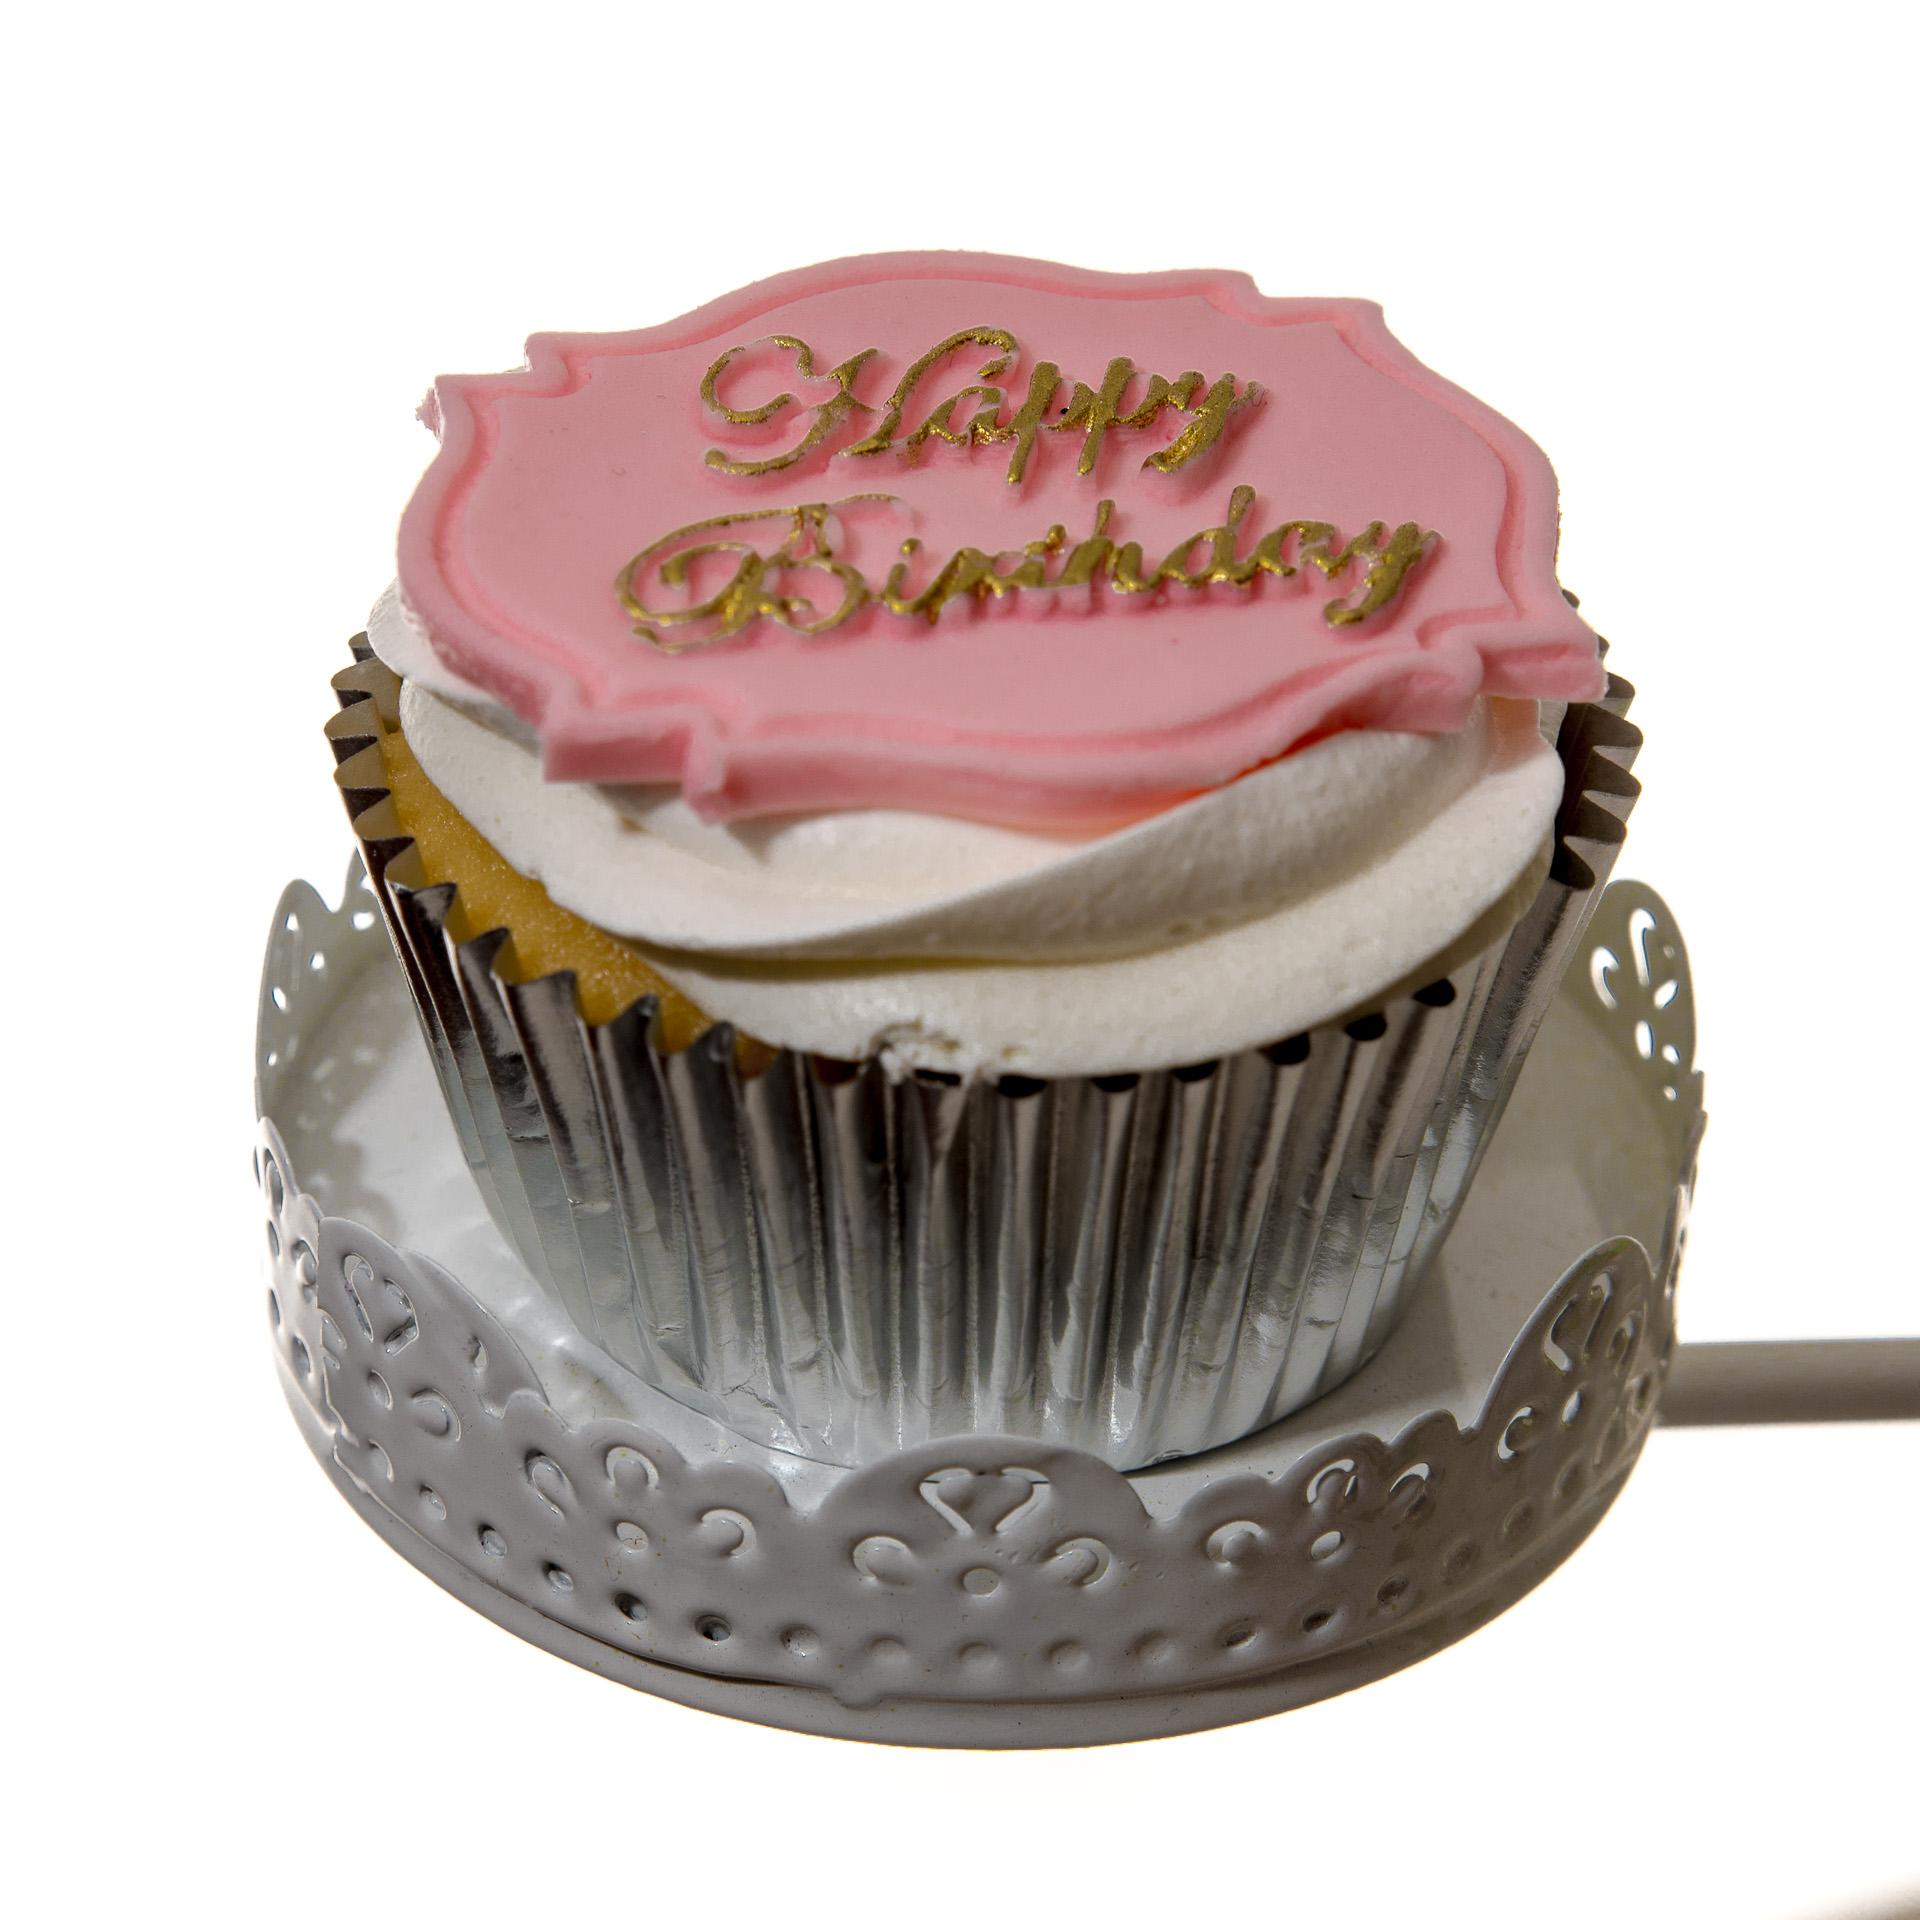 Happy-Birthday-Cupcakes.jpg